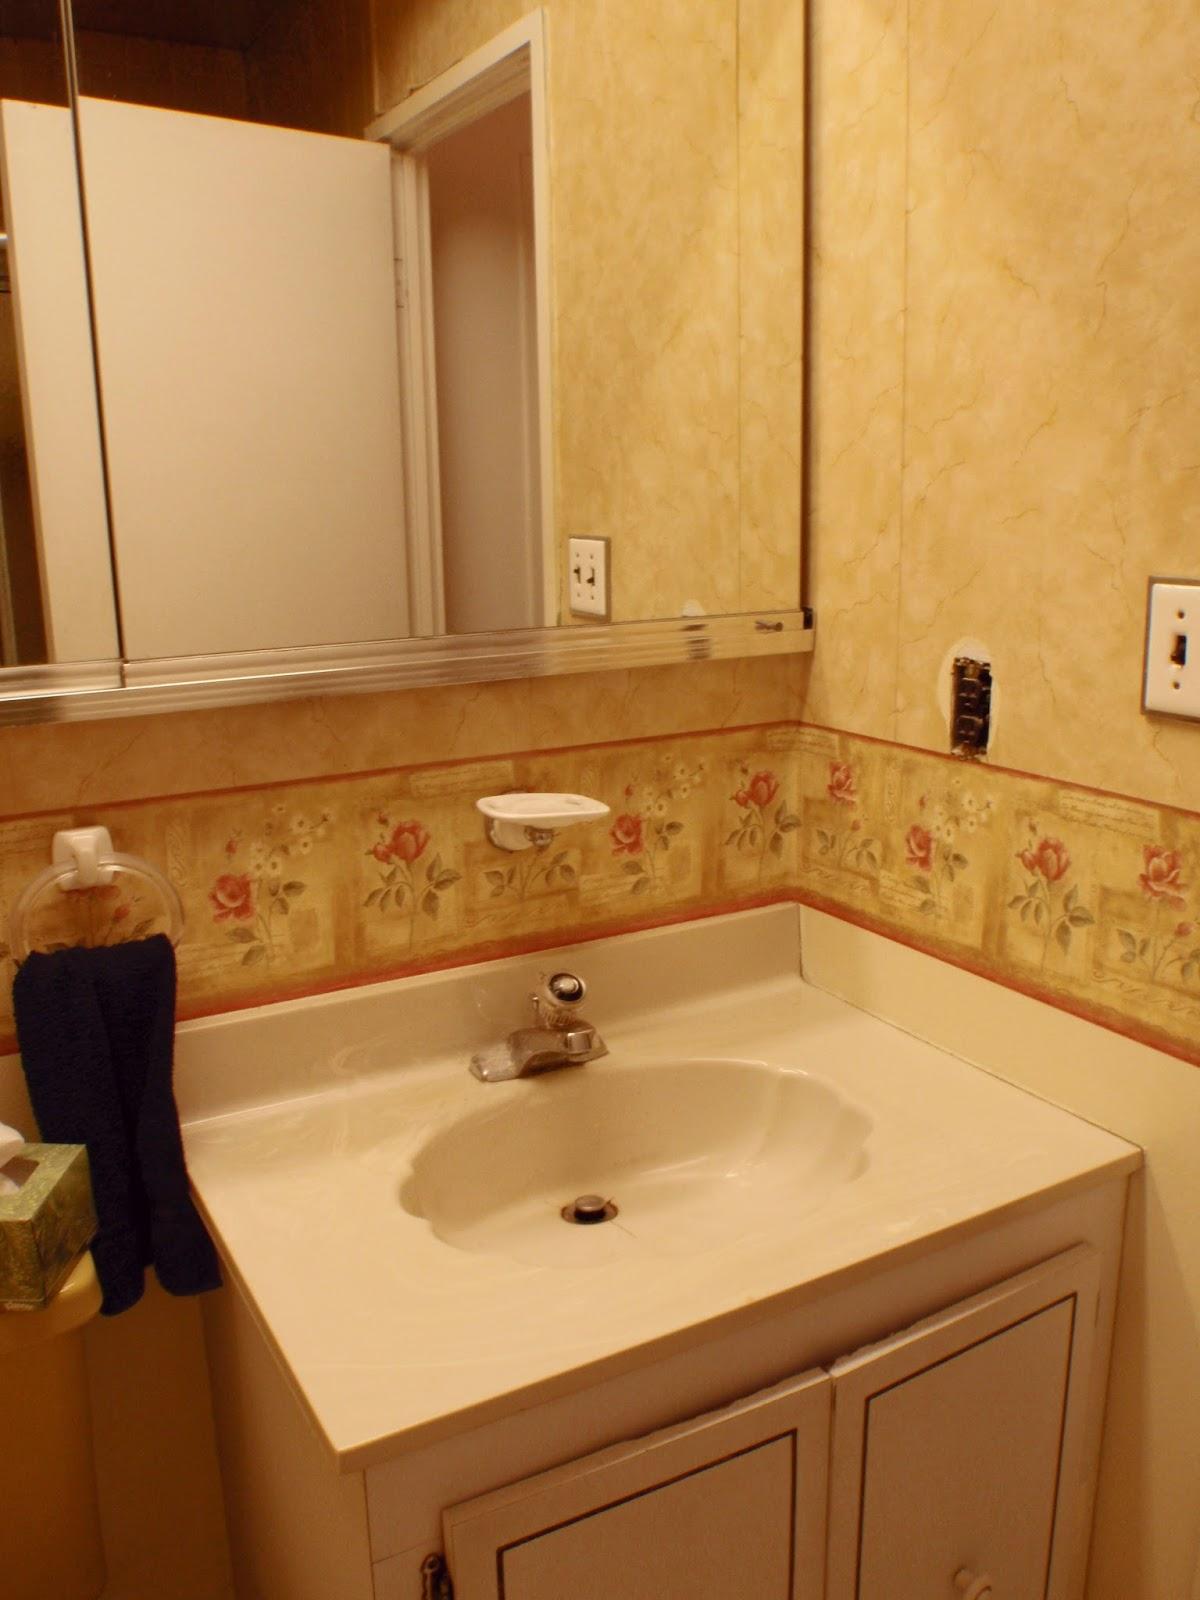 The obligatory blog august 2013 for Avocado green bathroom ideas